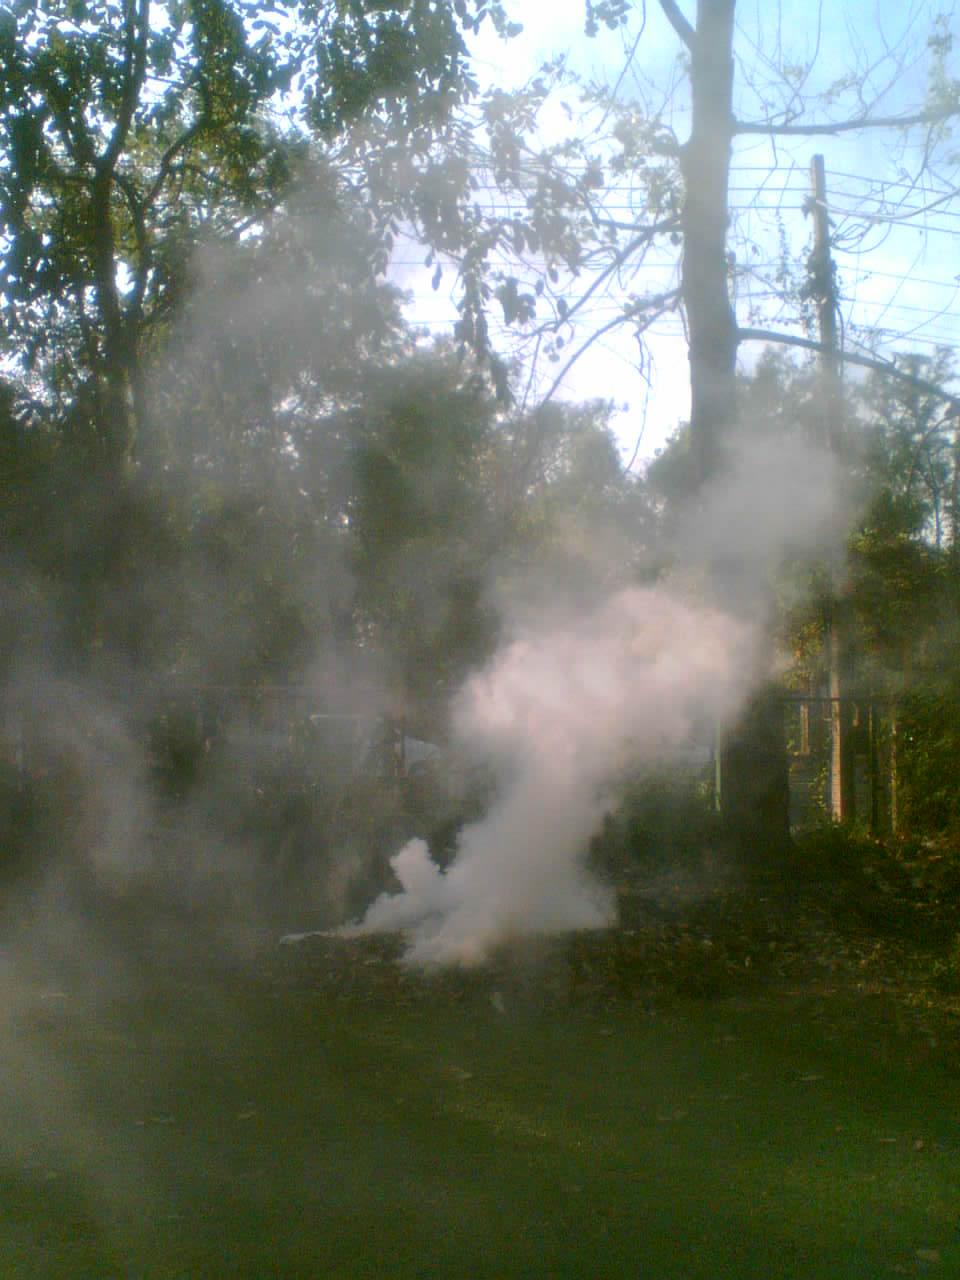 evening image of burning leaves in delhiuniversity